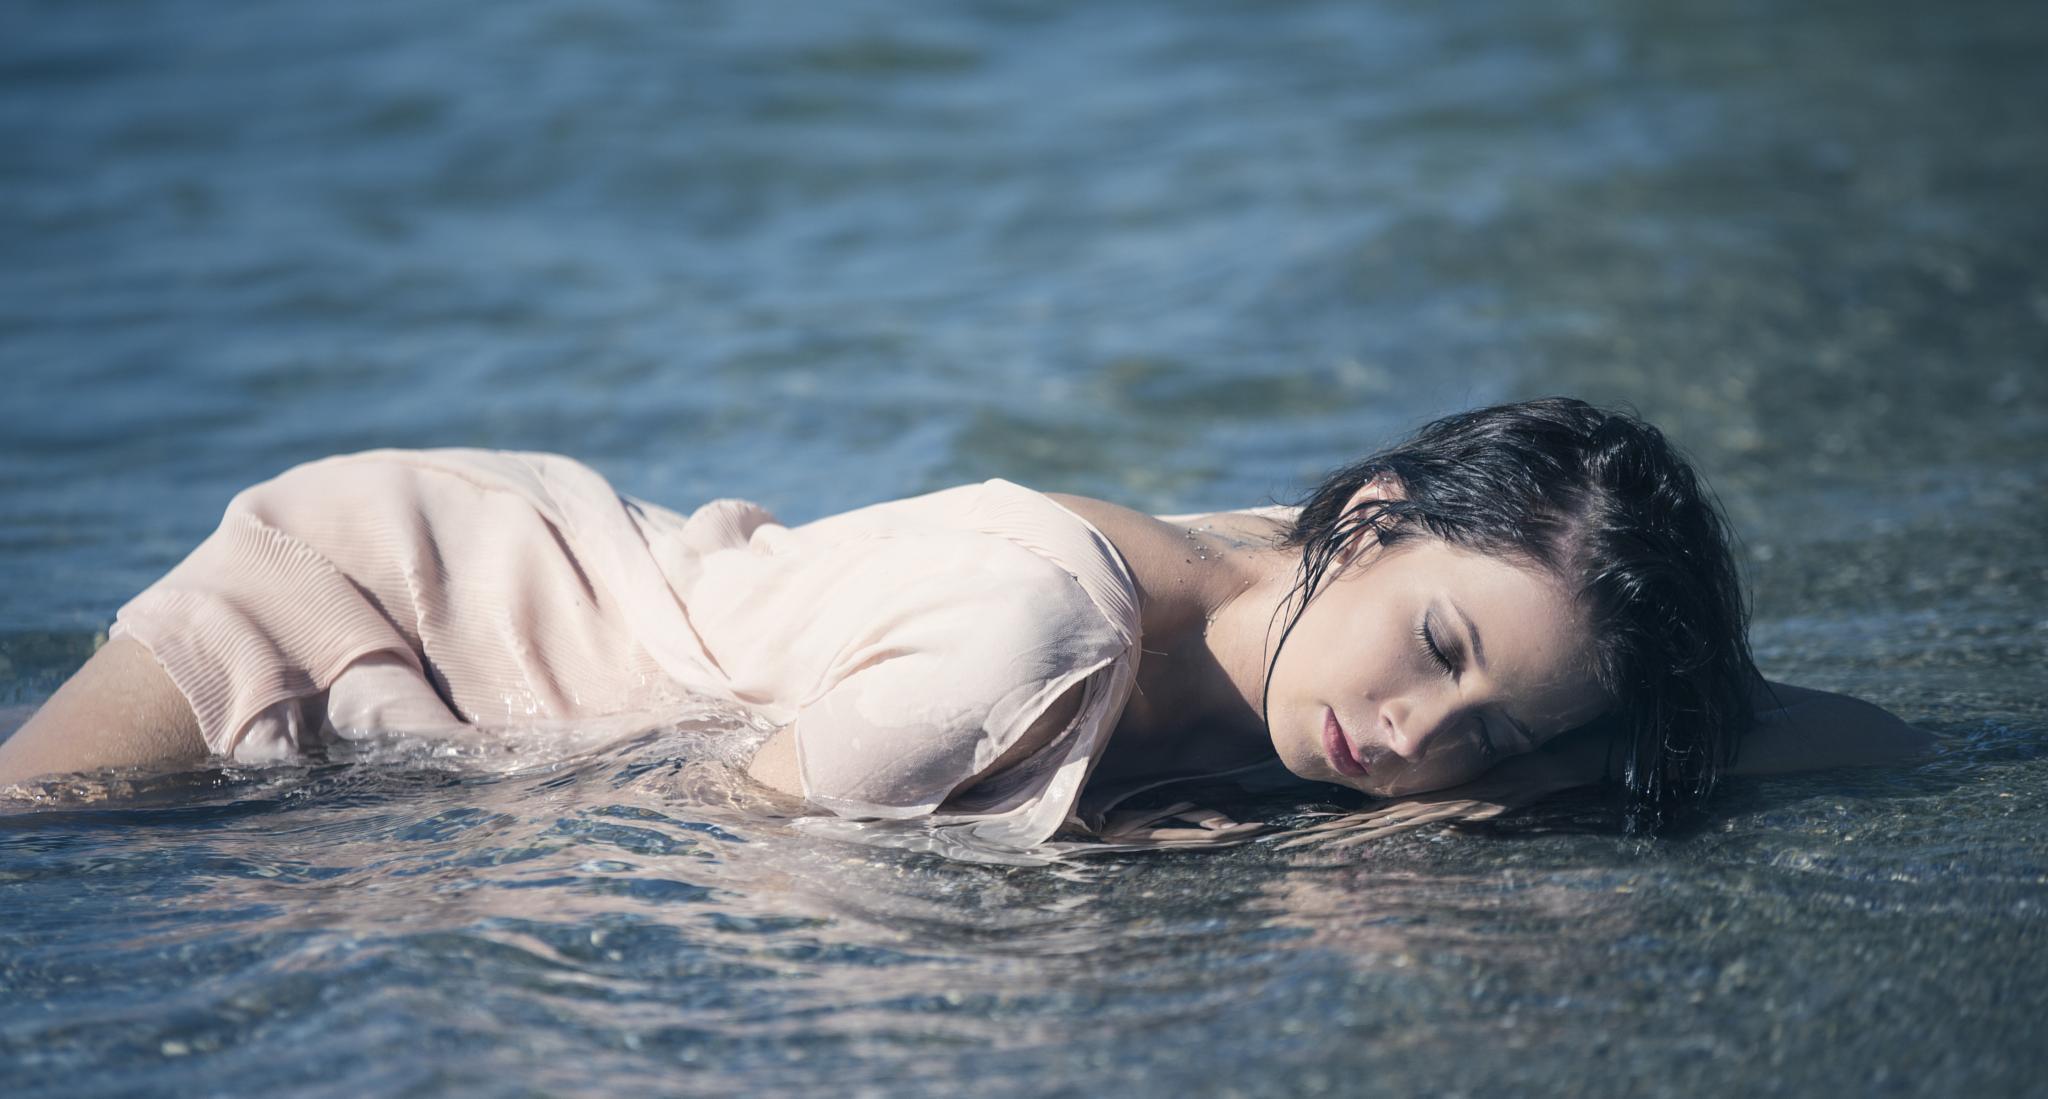 Manon by Porte516